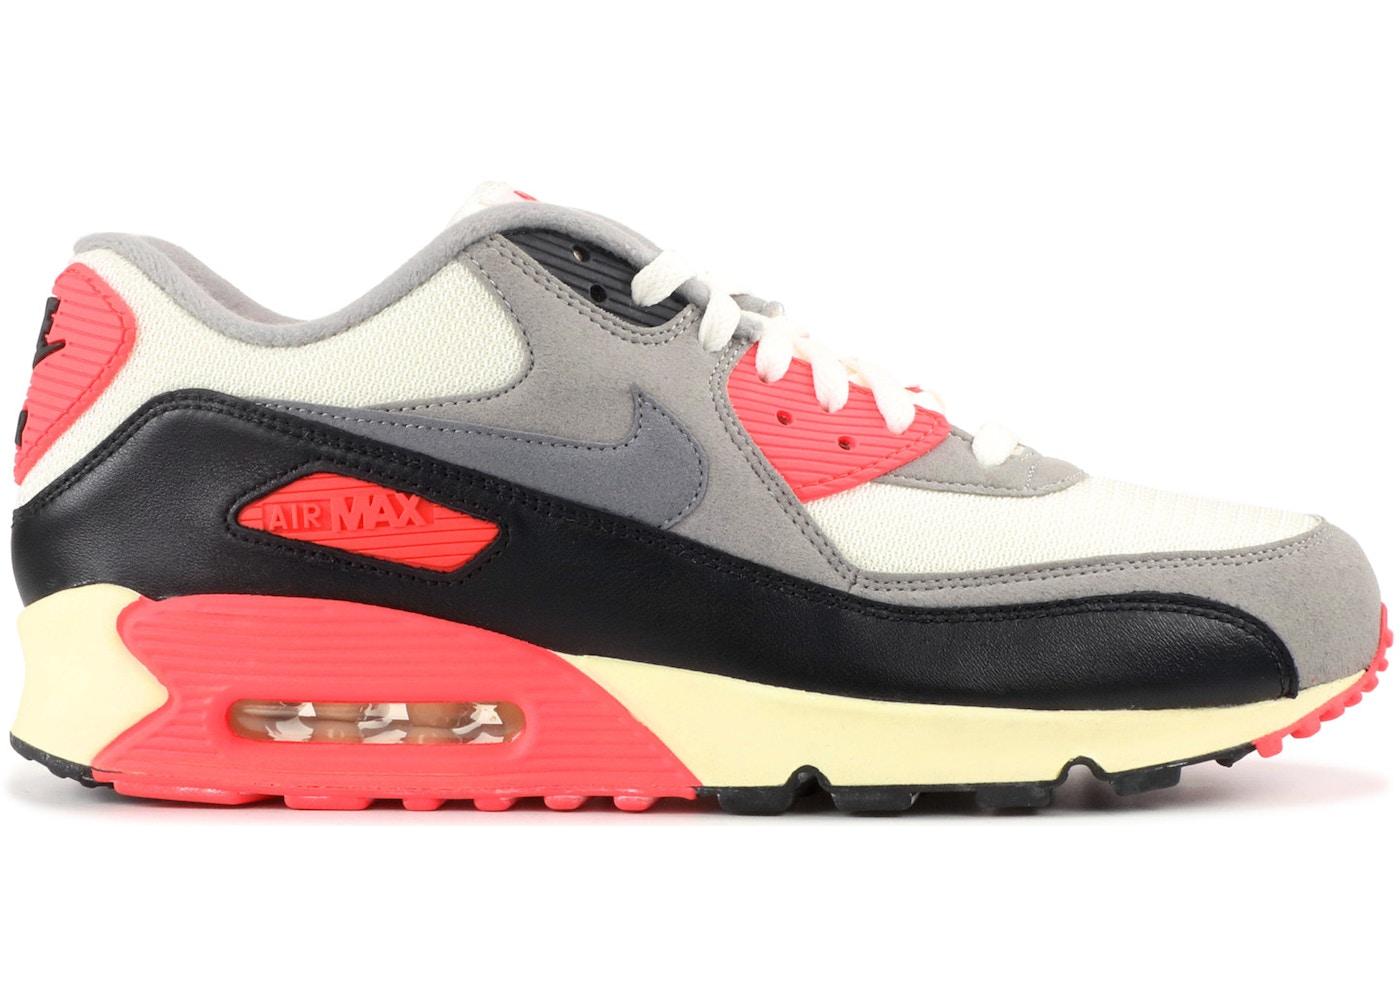 Nike Air Max 90 Infrared Vintage 2013 (B-Grade)